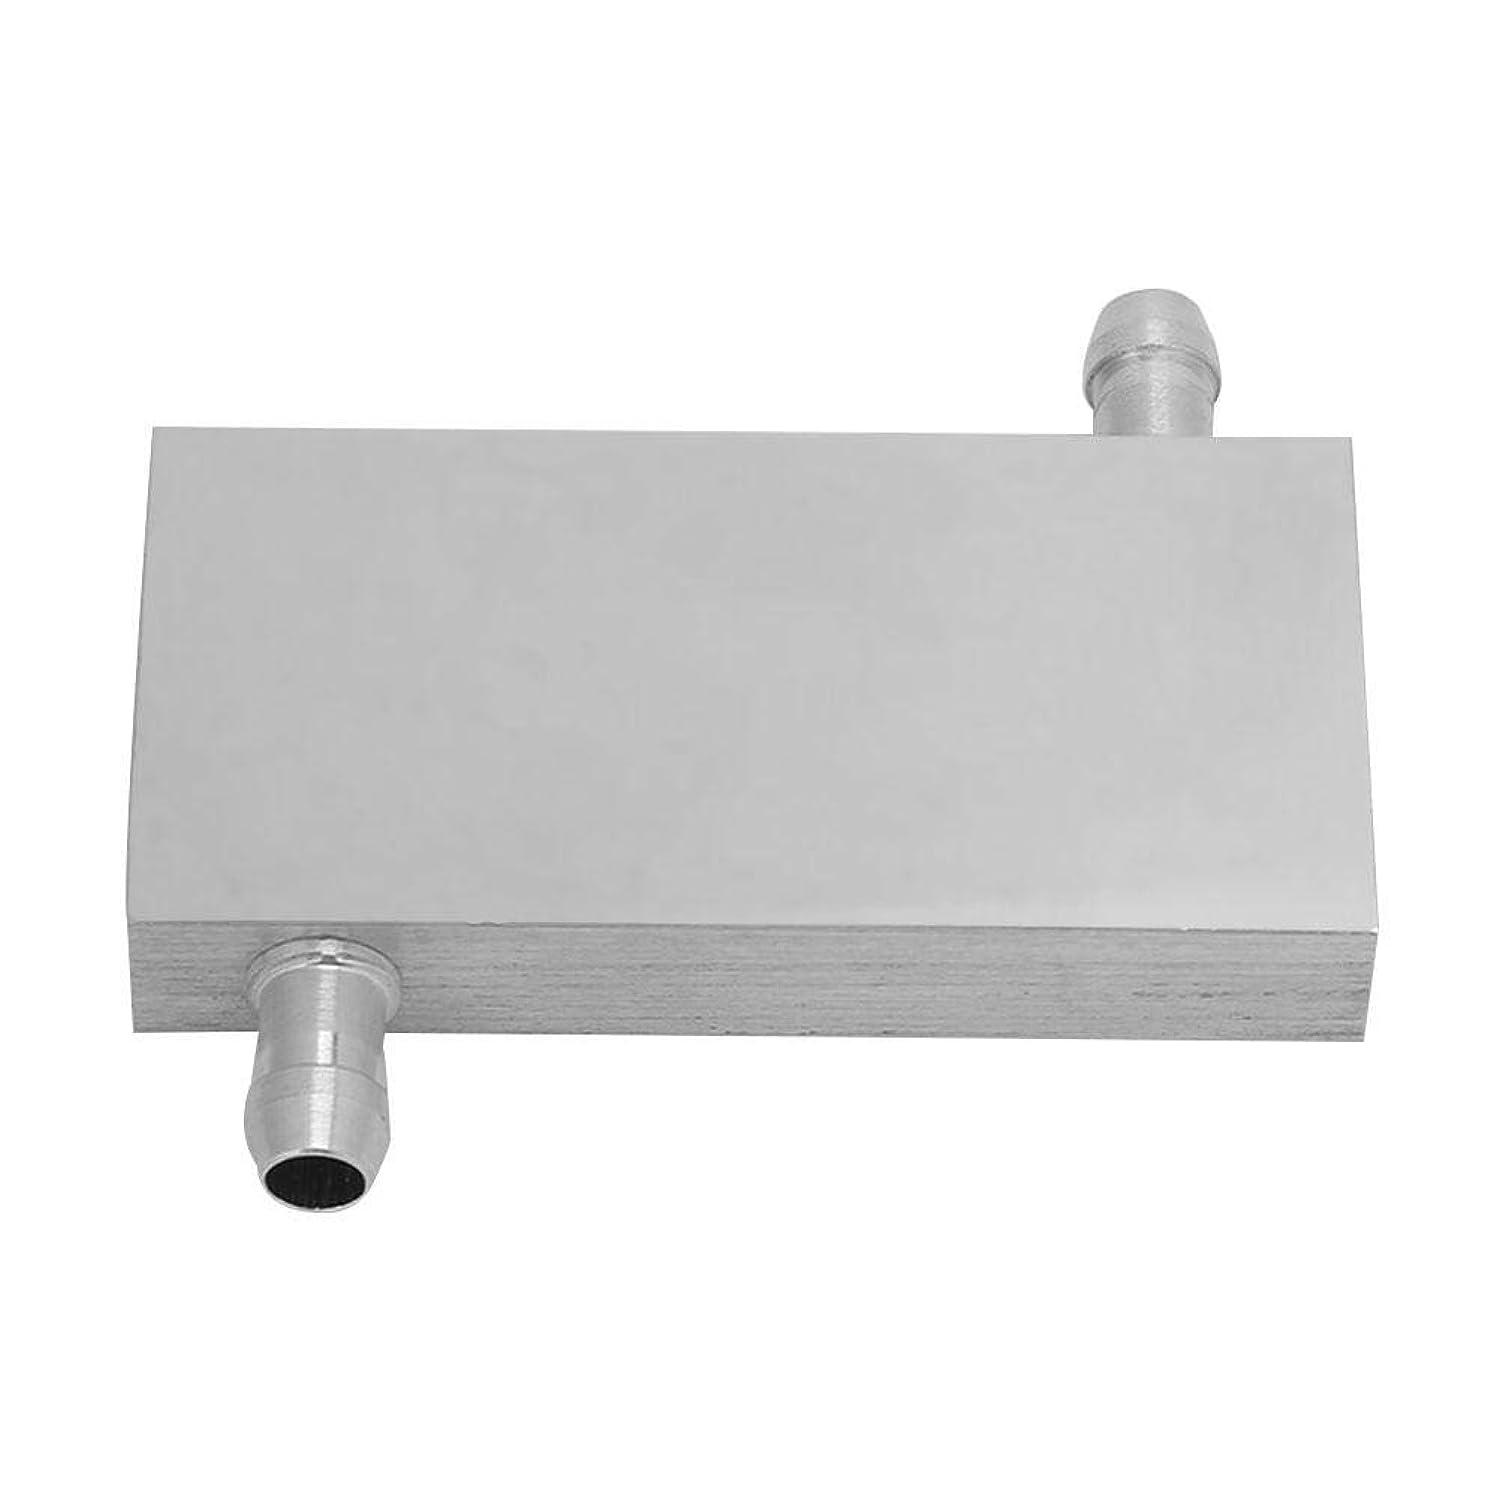 Water Cooling Block, Aluminum Water Cooling Block Waterblock Cooler Water Cooling Head Light & Right Effluent for CPU Graphics Radiator Heatsink(40 80 12mm)